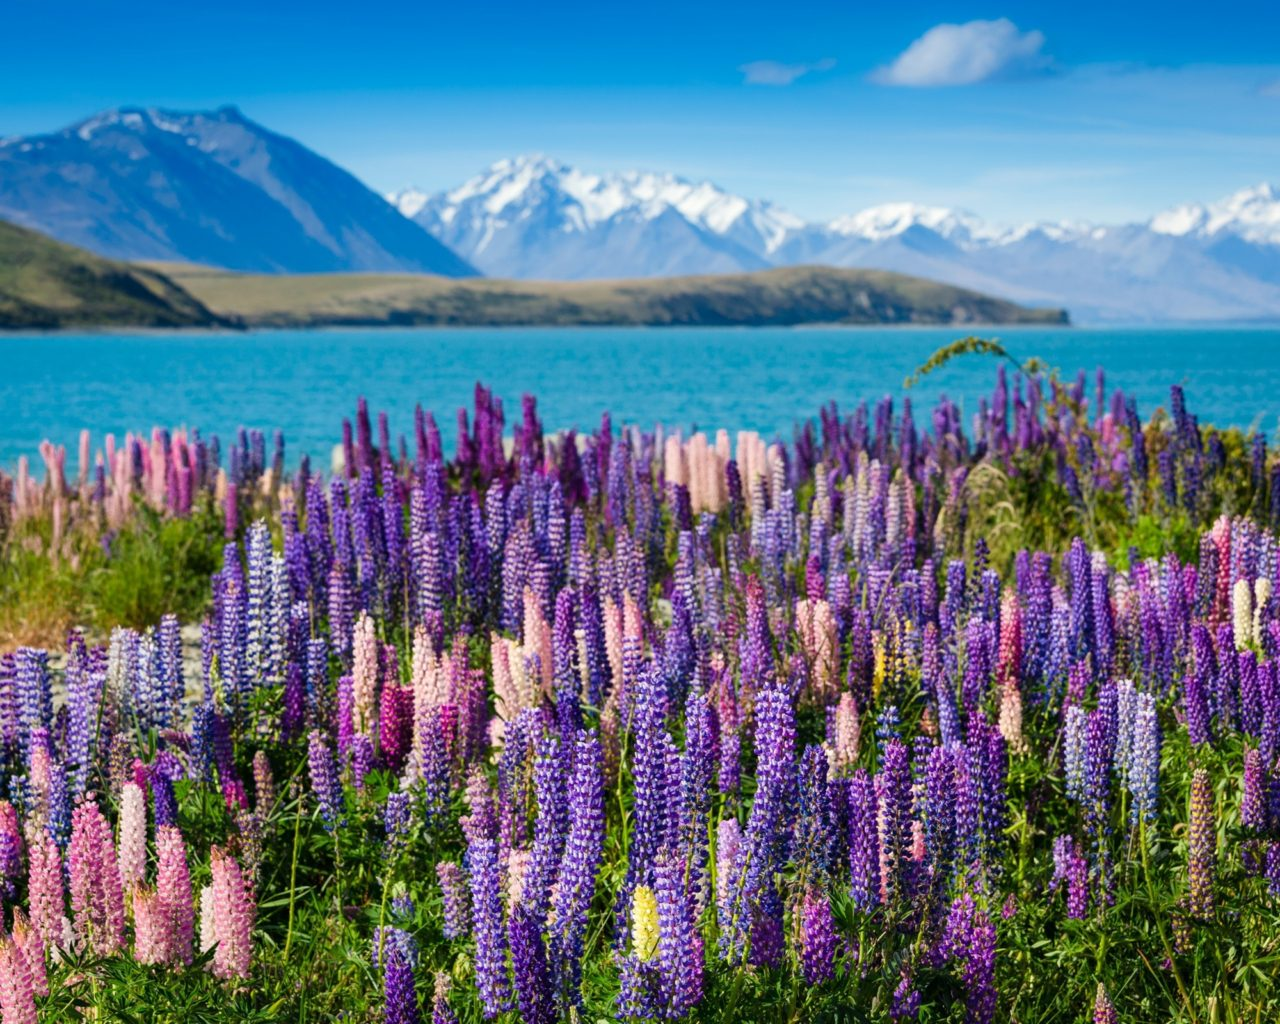 Stunning Fall Wallpapers Flowers Landscape Flowers Lake Splendor Water Mountains